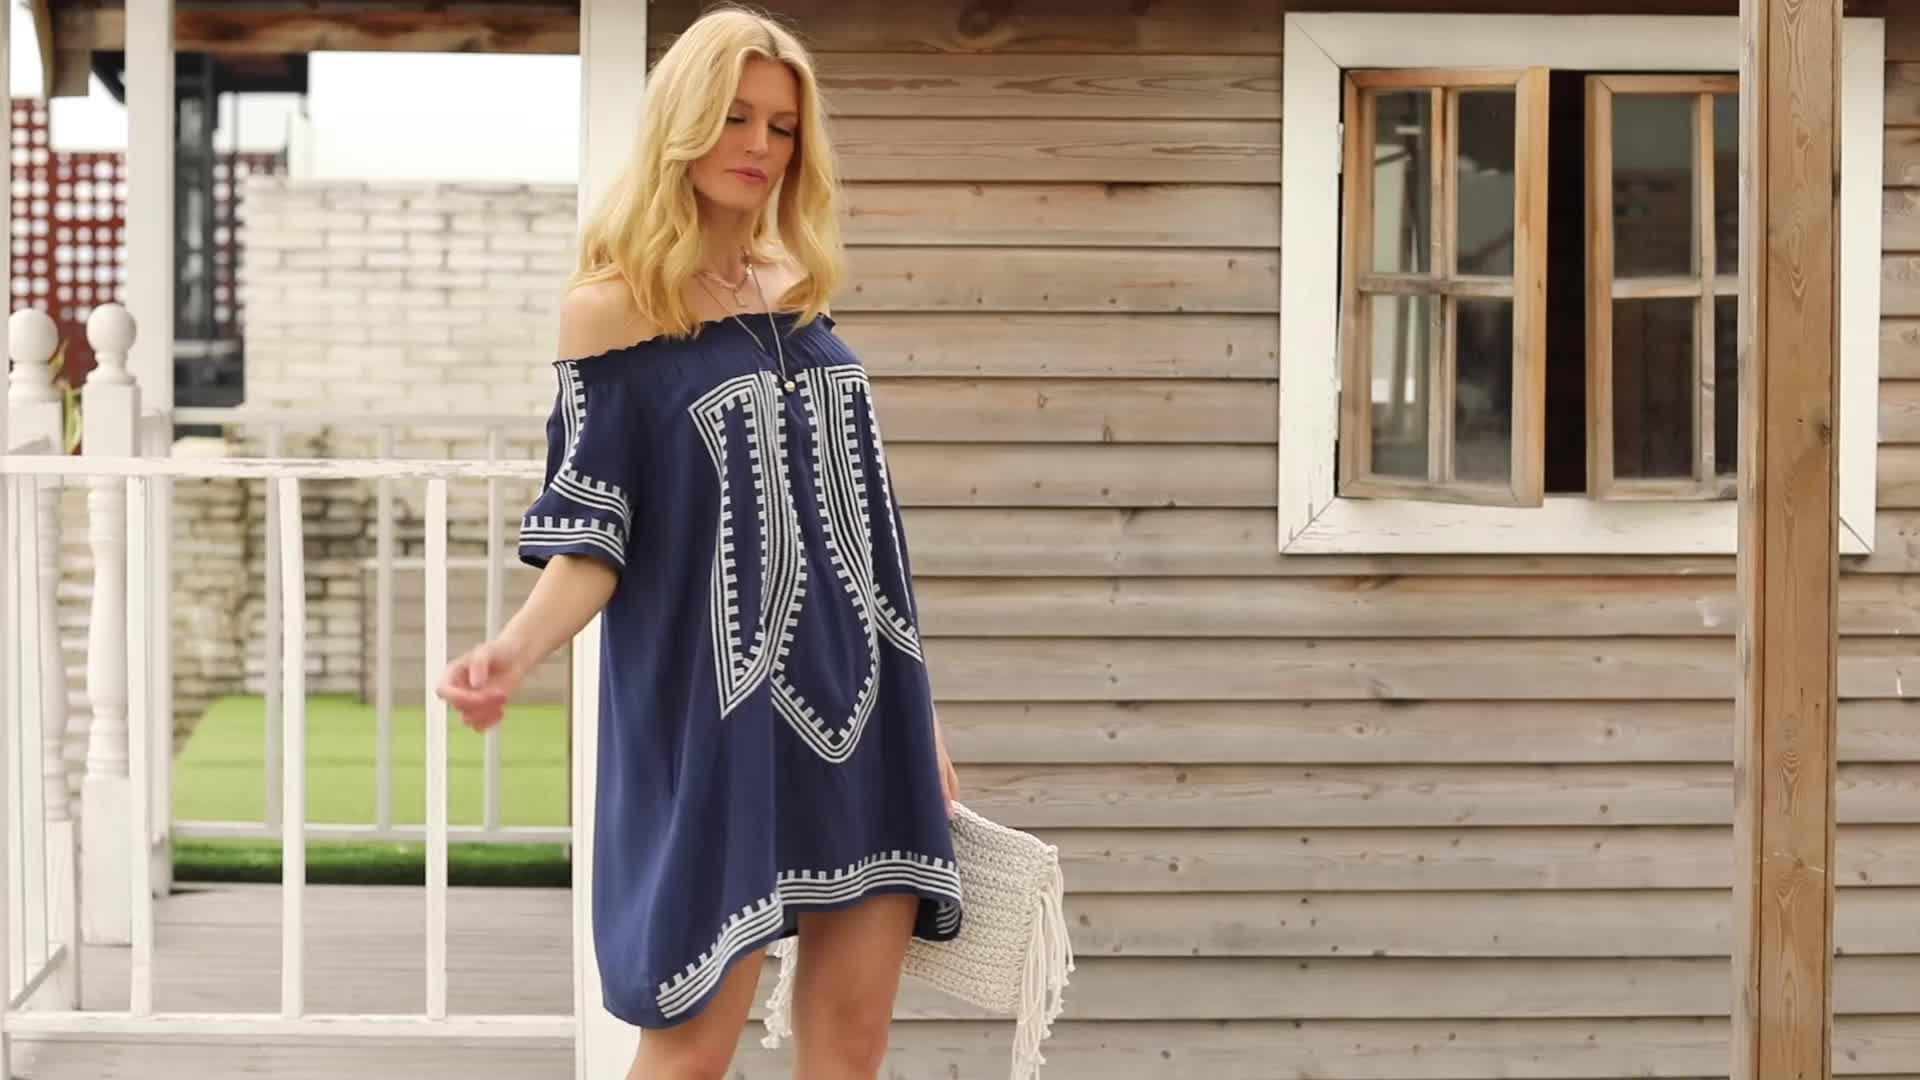 New Arrival Bohemian Vibe Geometric Print Off The Shoulder Beach Dress Beachwear Cover Up